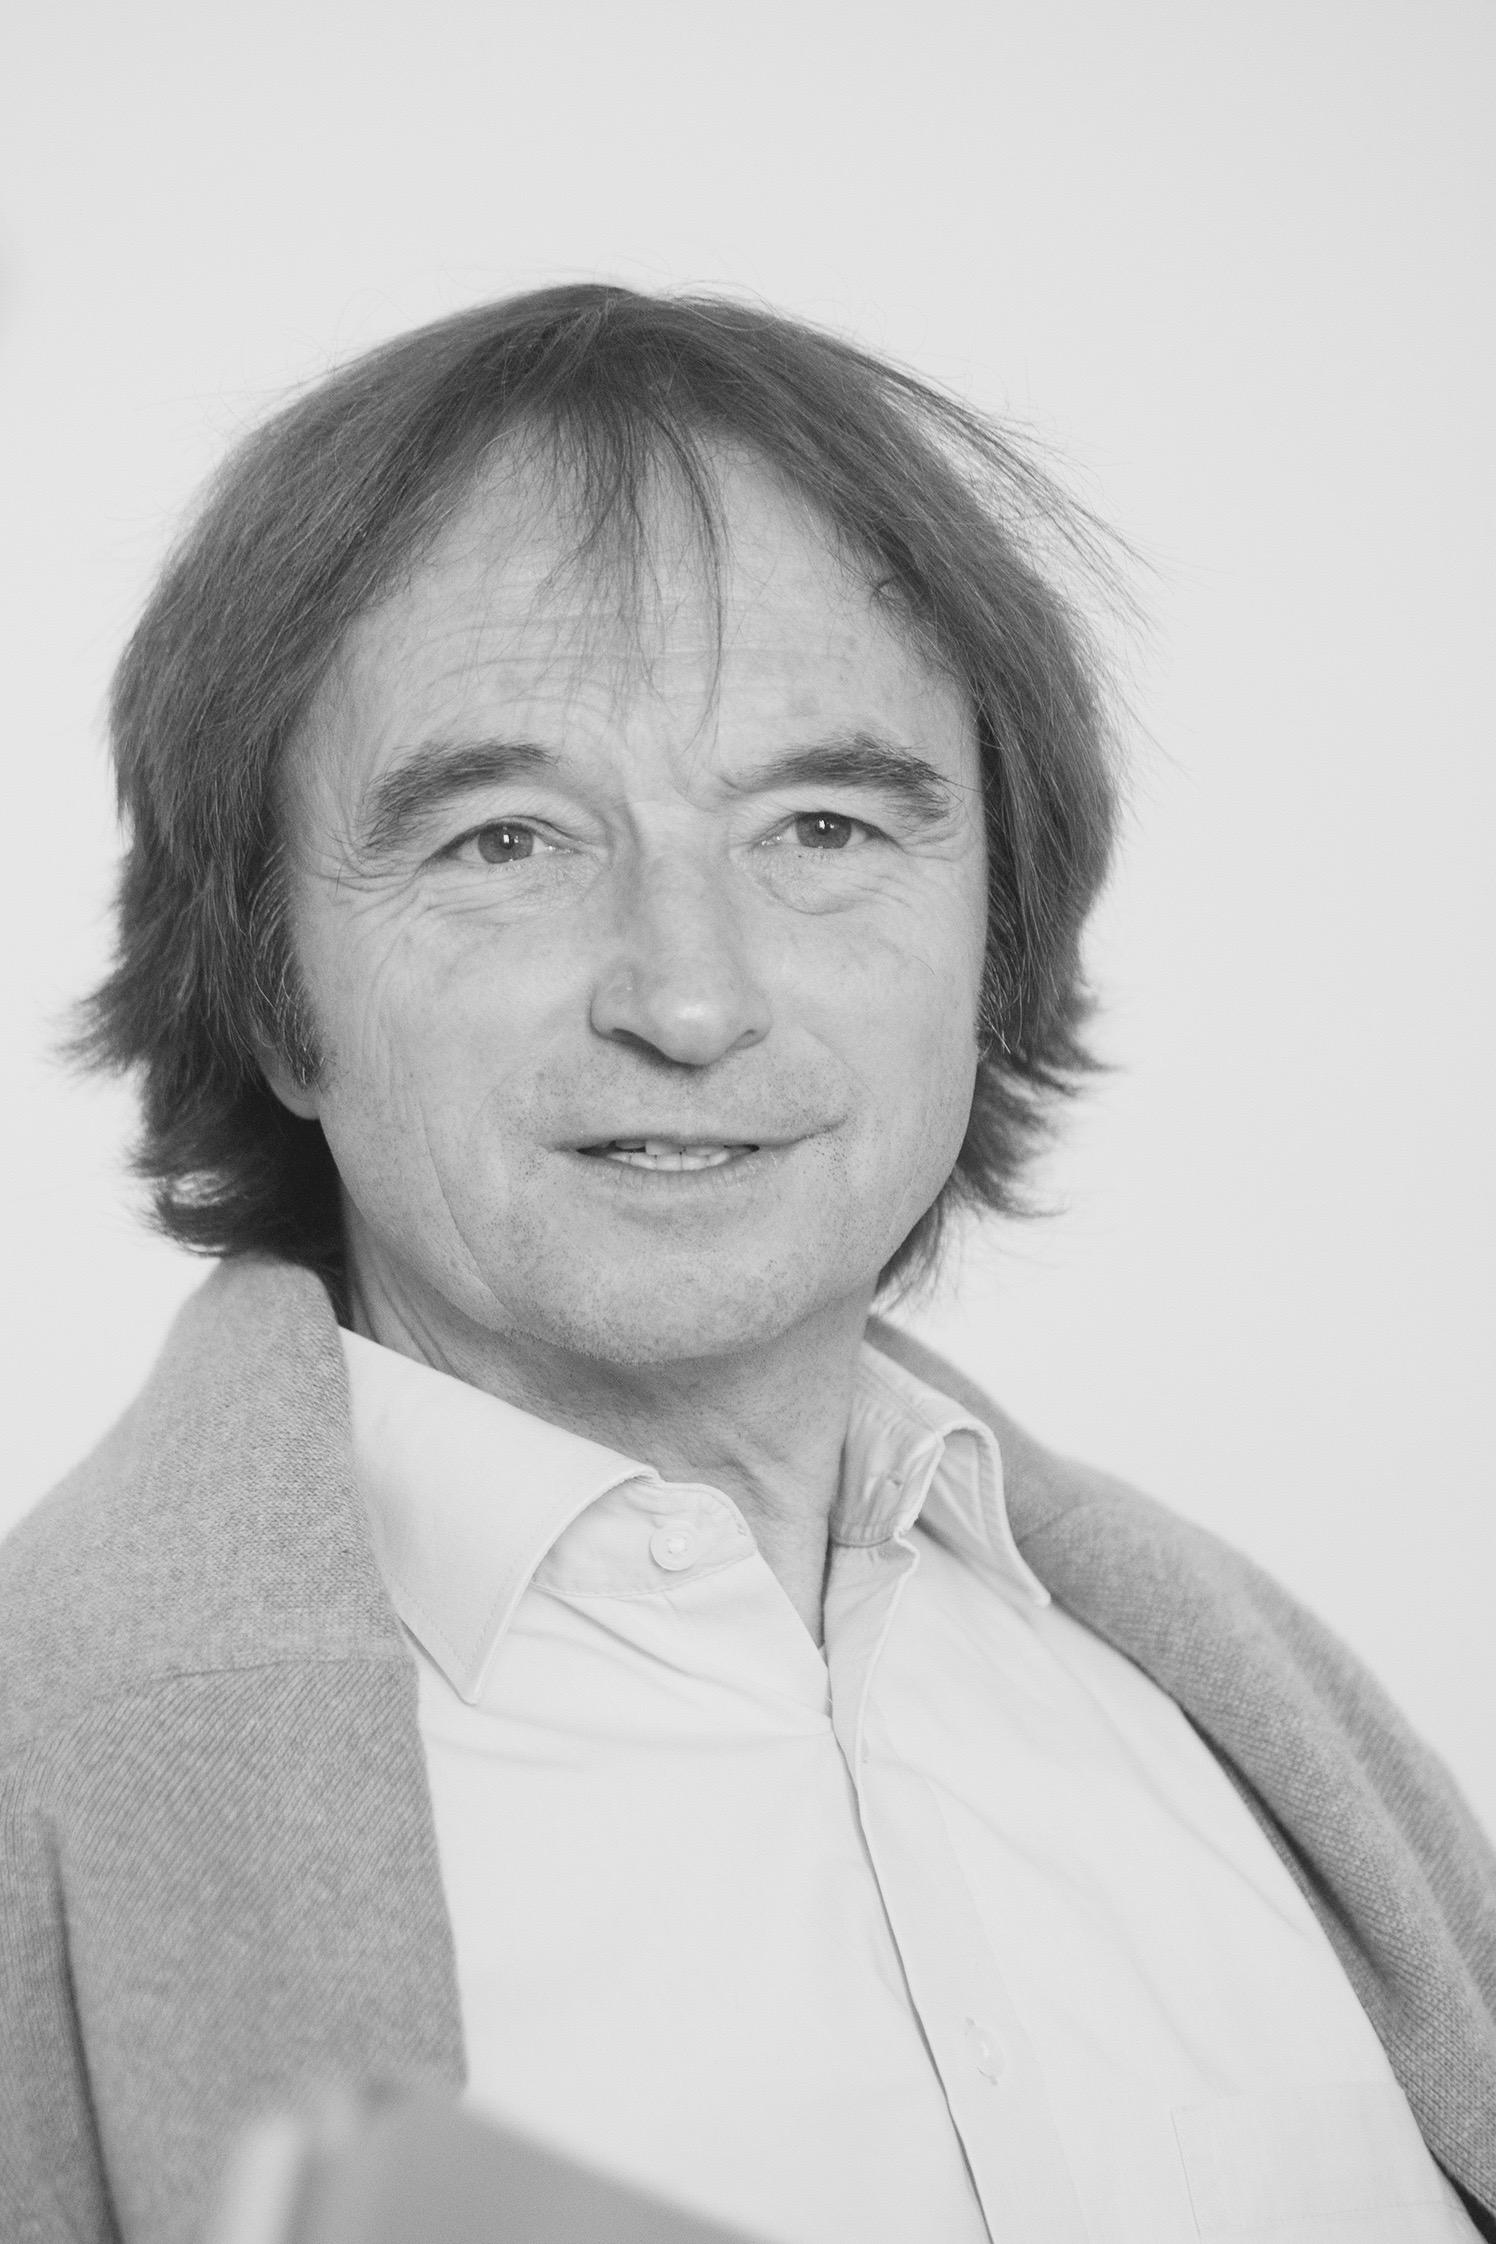 Dr. Rudi Piwko